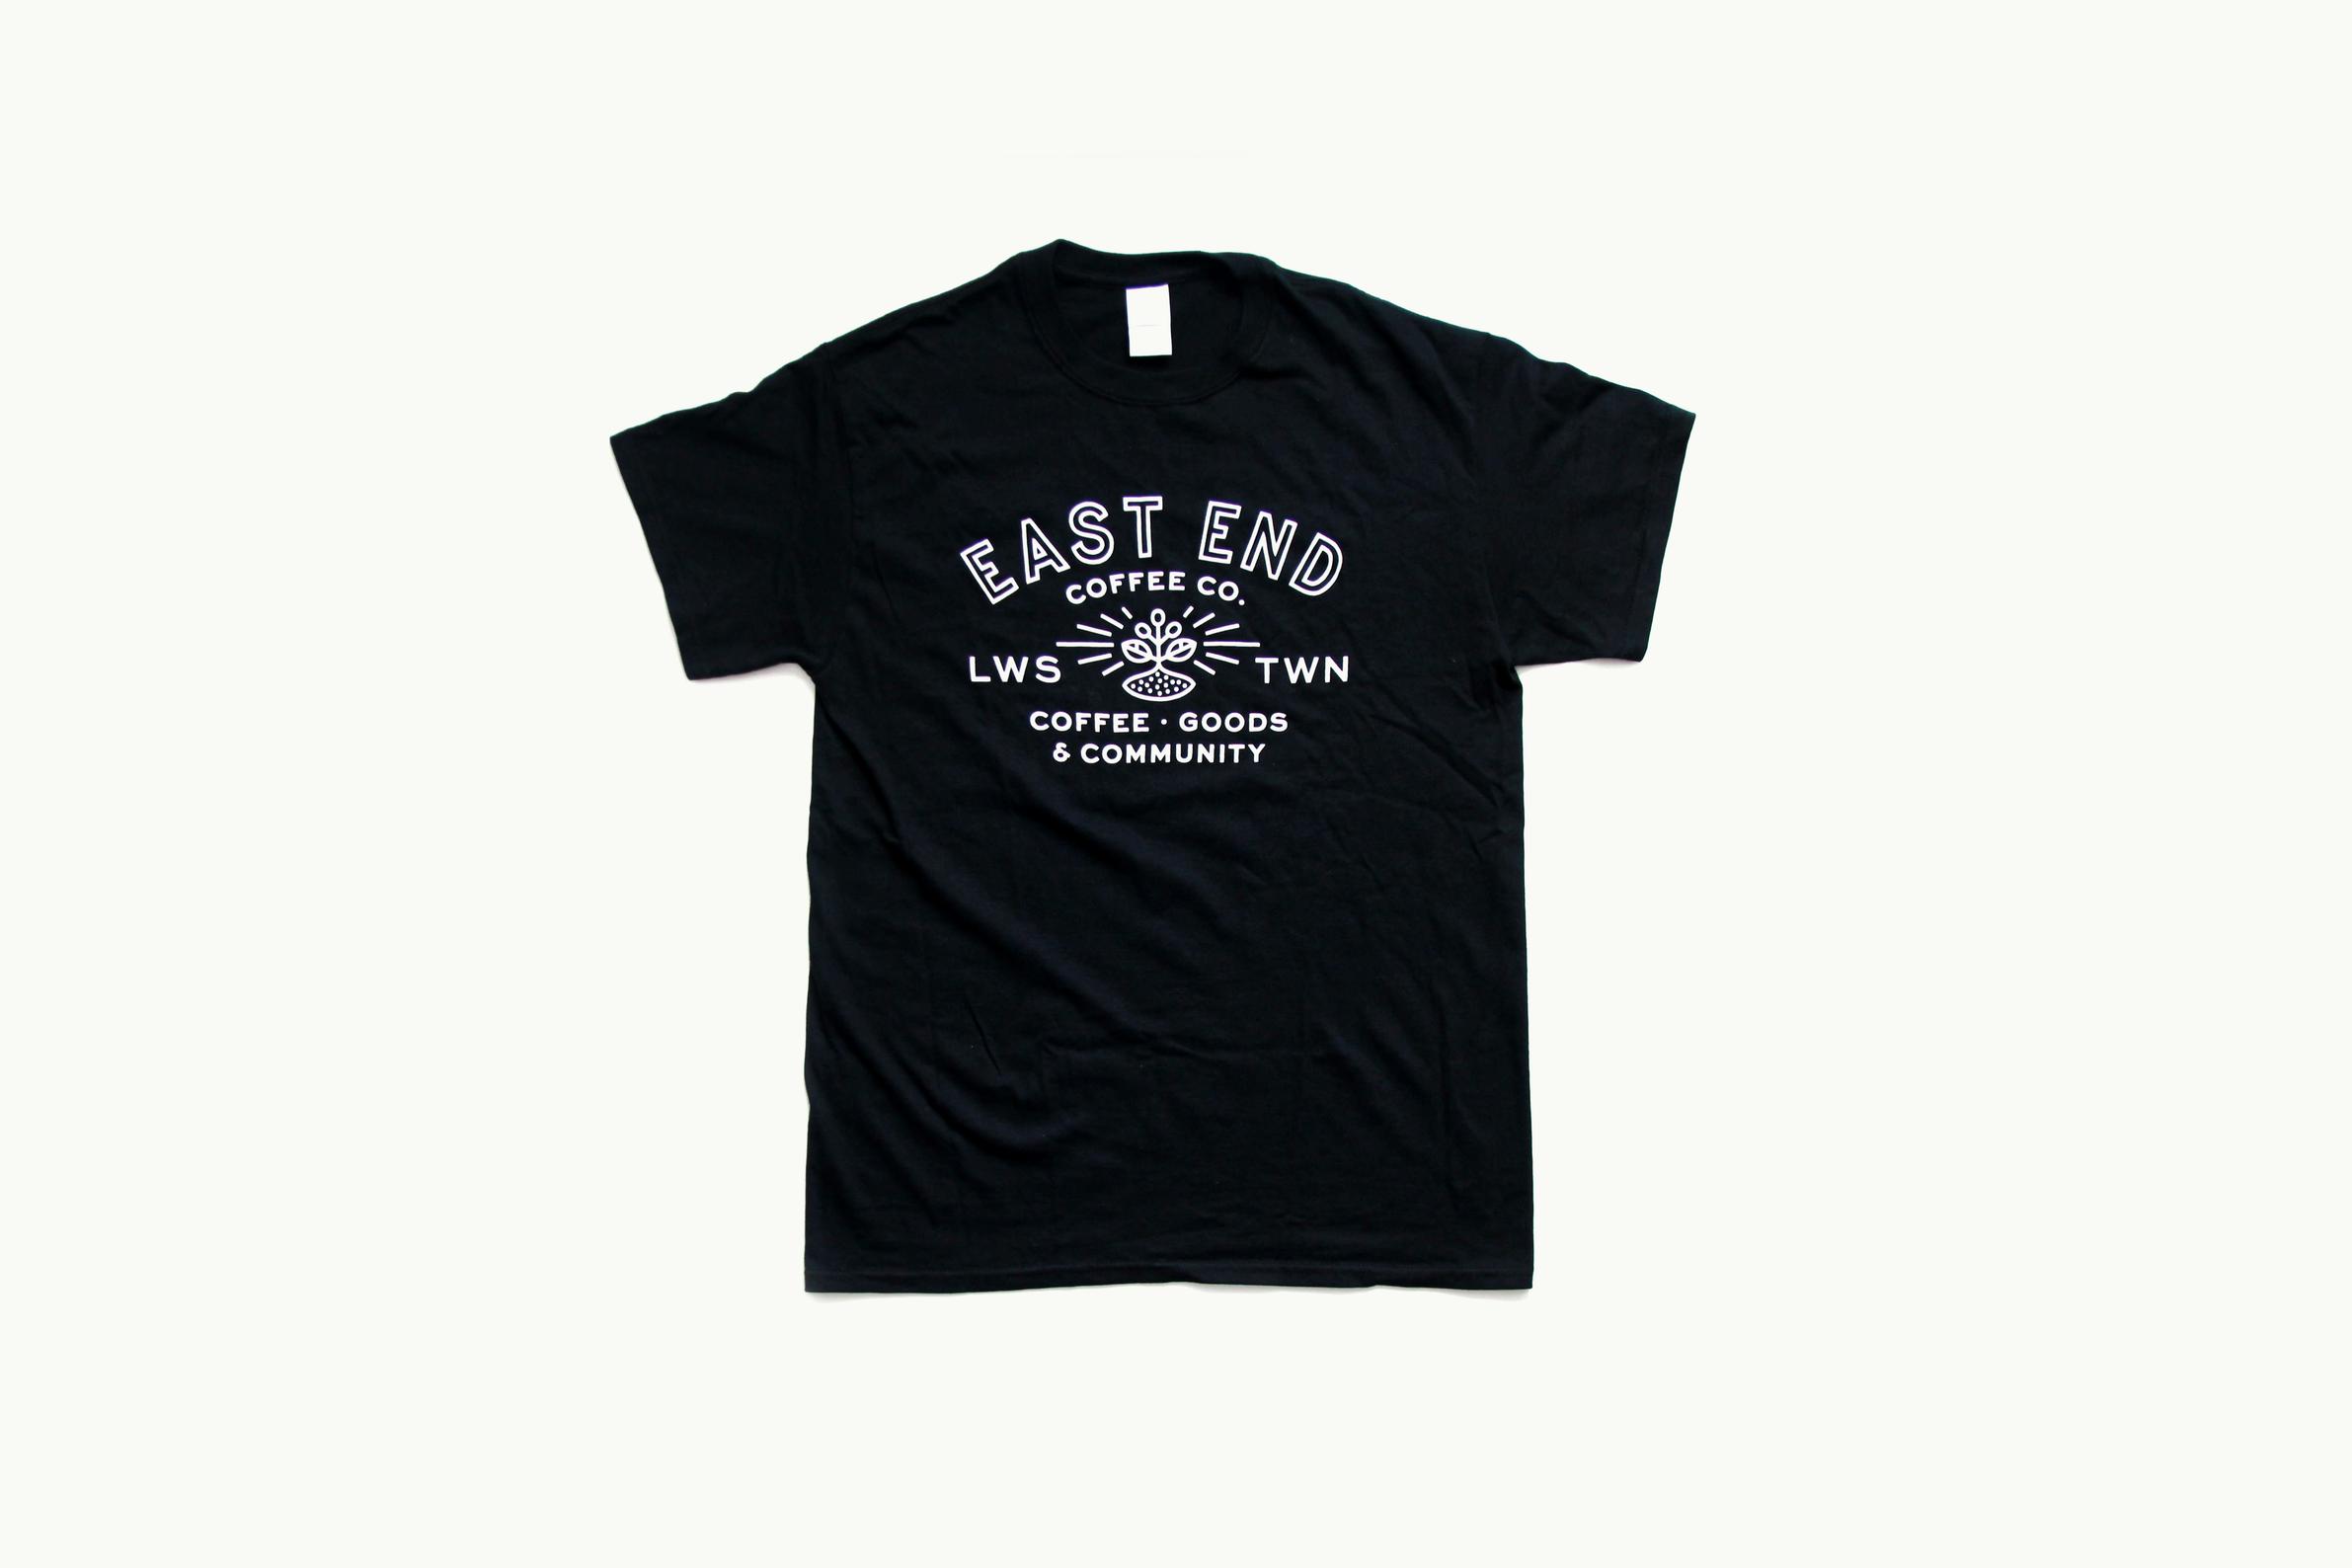 east_end_tee.png